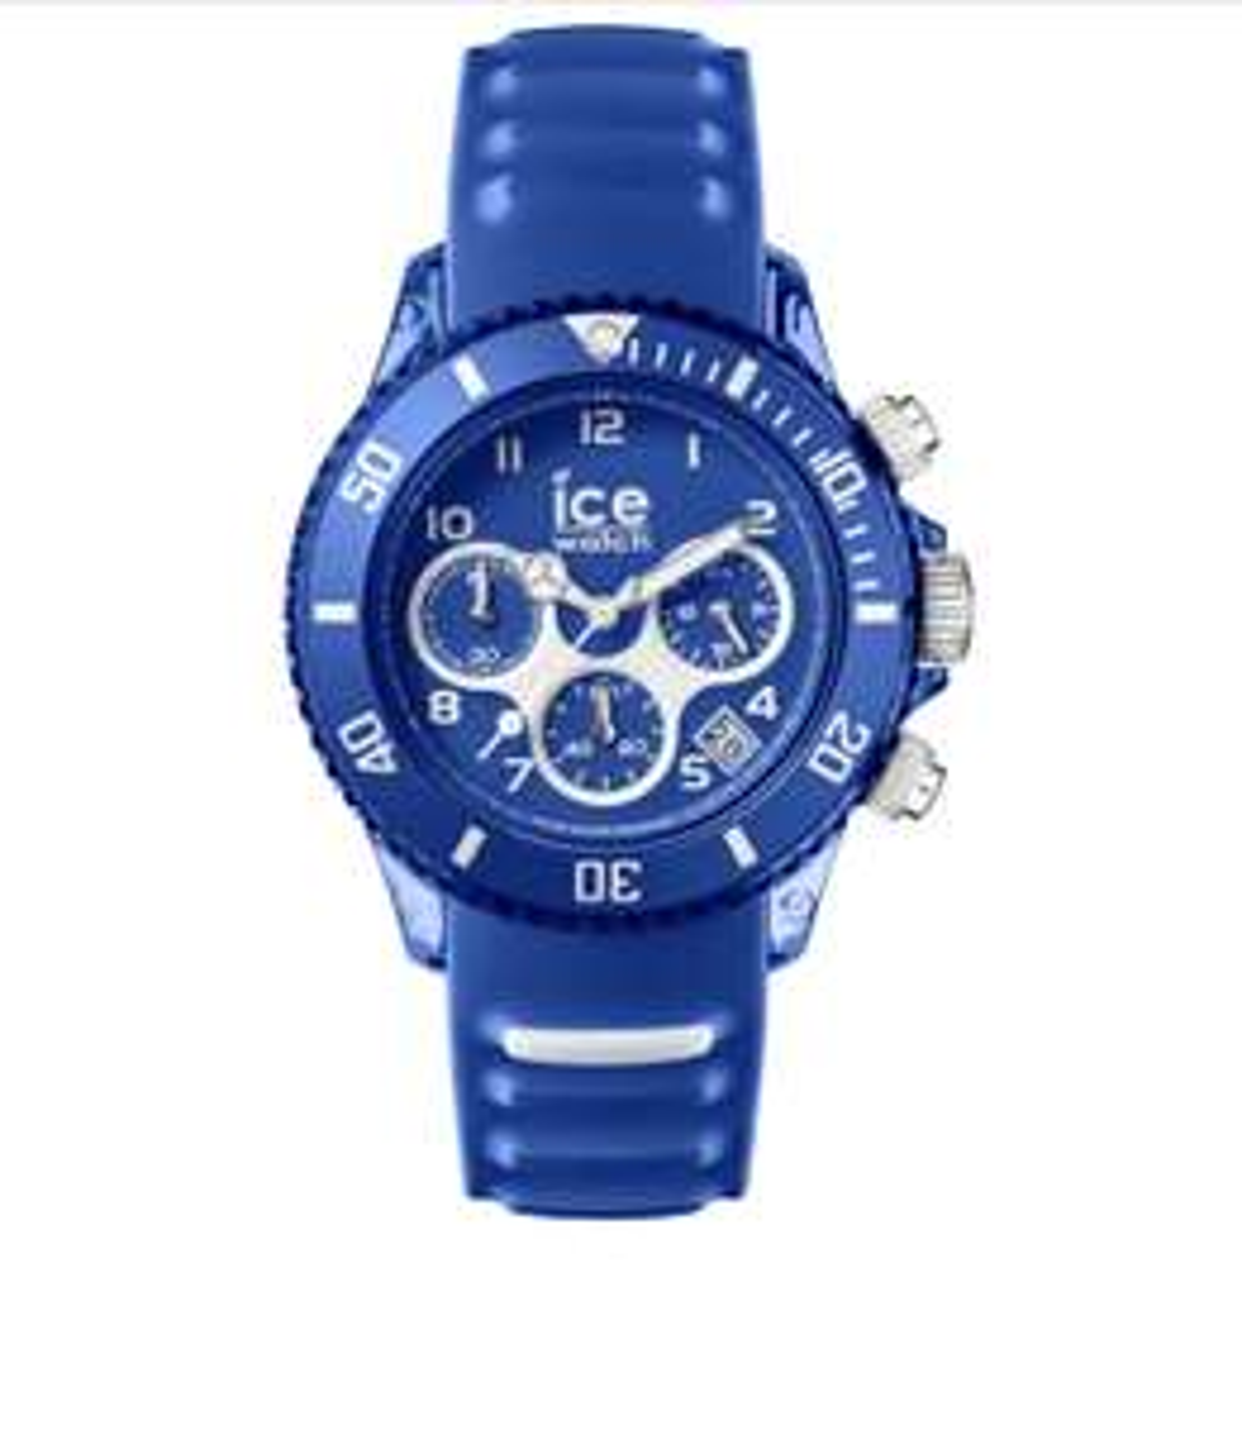 Ice-Watch Ice Aqua Watch 001459 - £48.99 Watches2